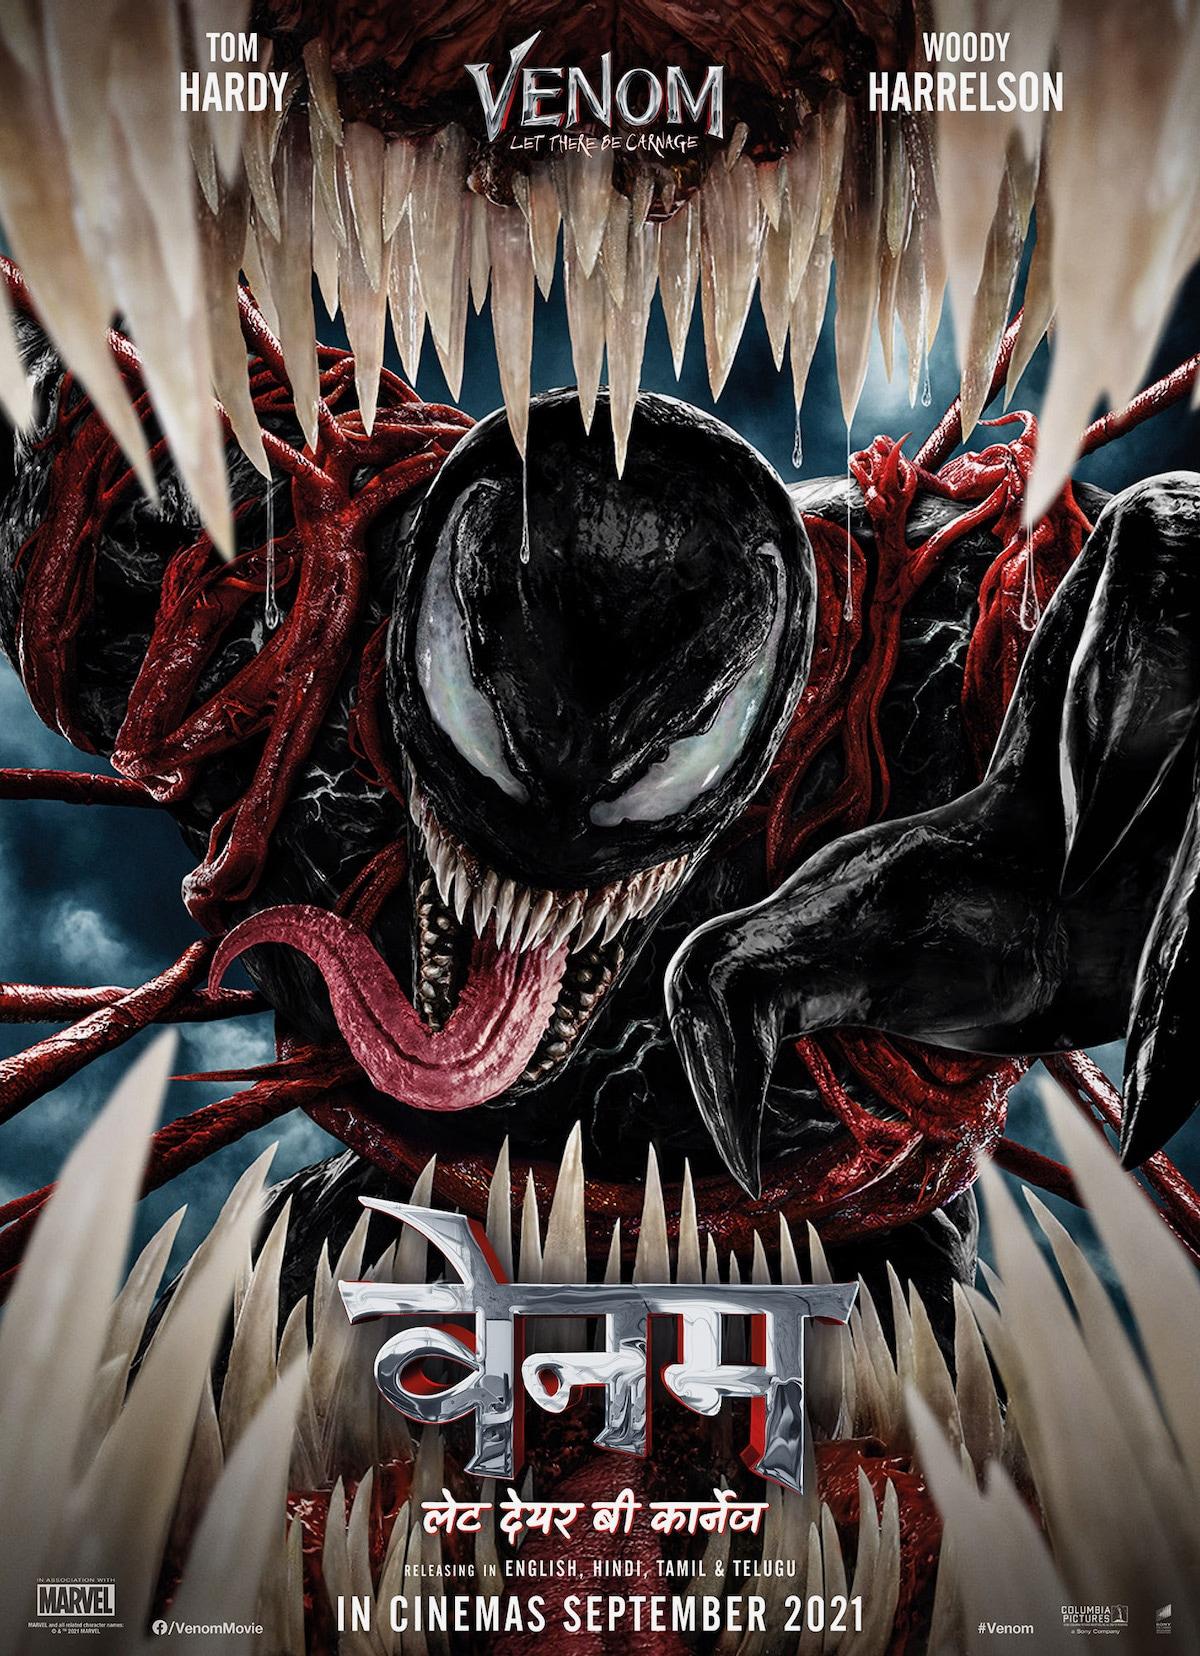 venom 2 poster hindi venom 2 poster hindi